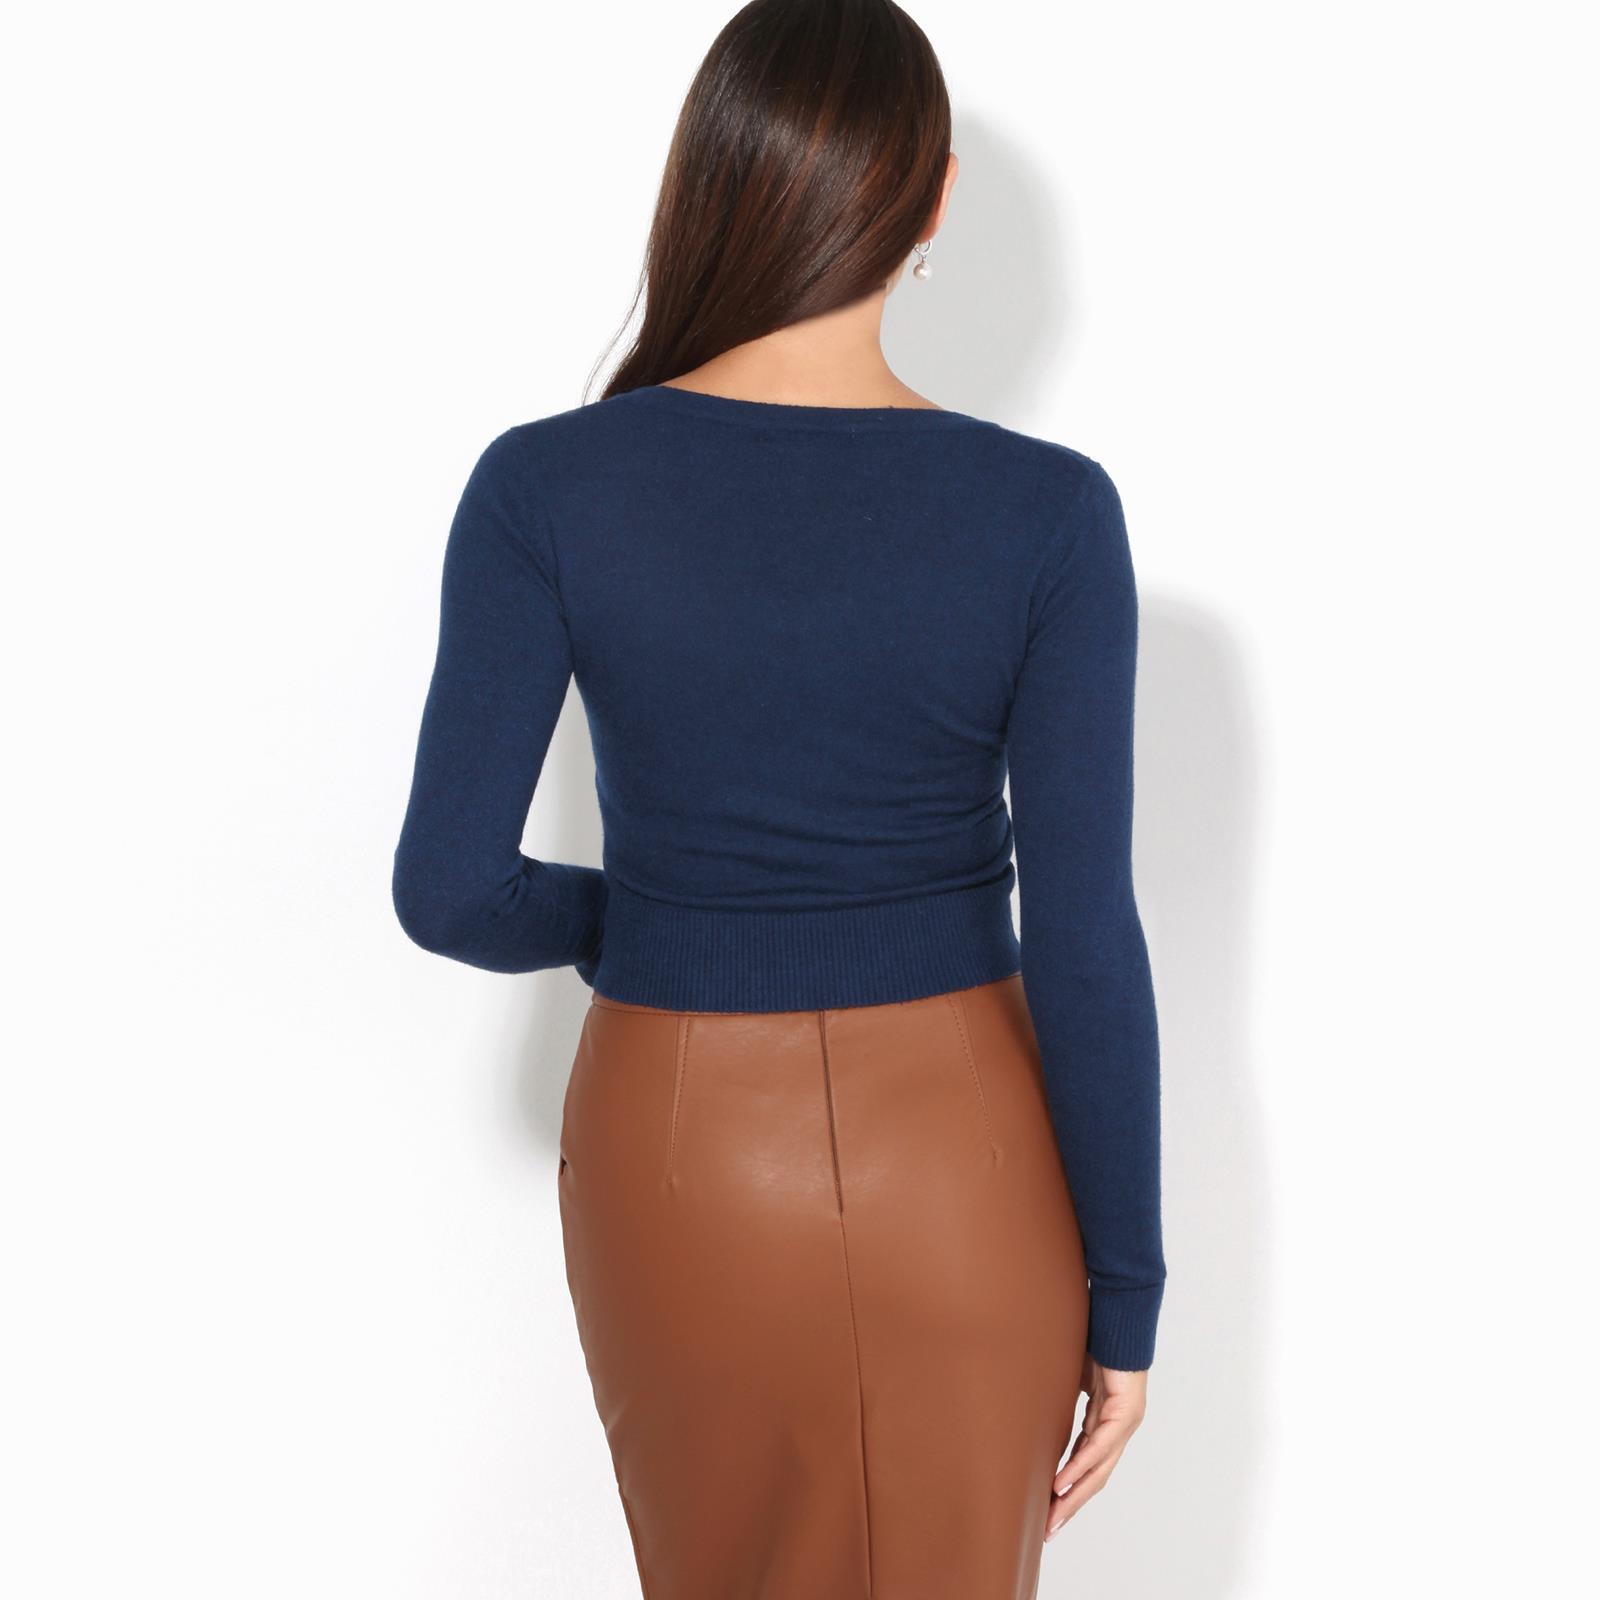 KRISP/® Women Ladies Cashmere Knit Cardigan Zip Up Soft Jumper Long Sleeve Crop Top Work